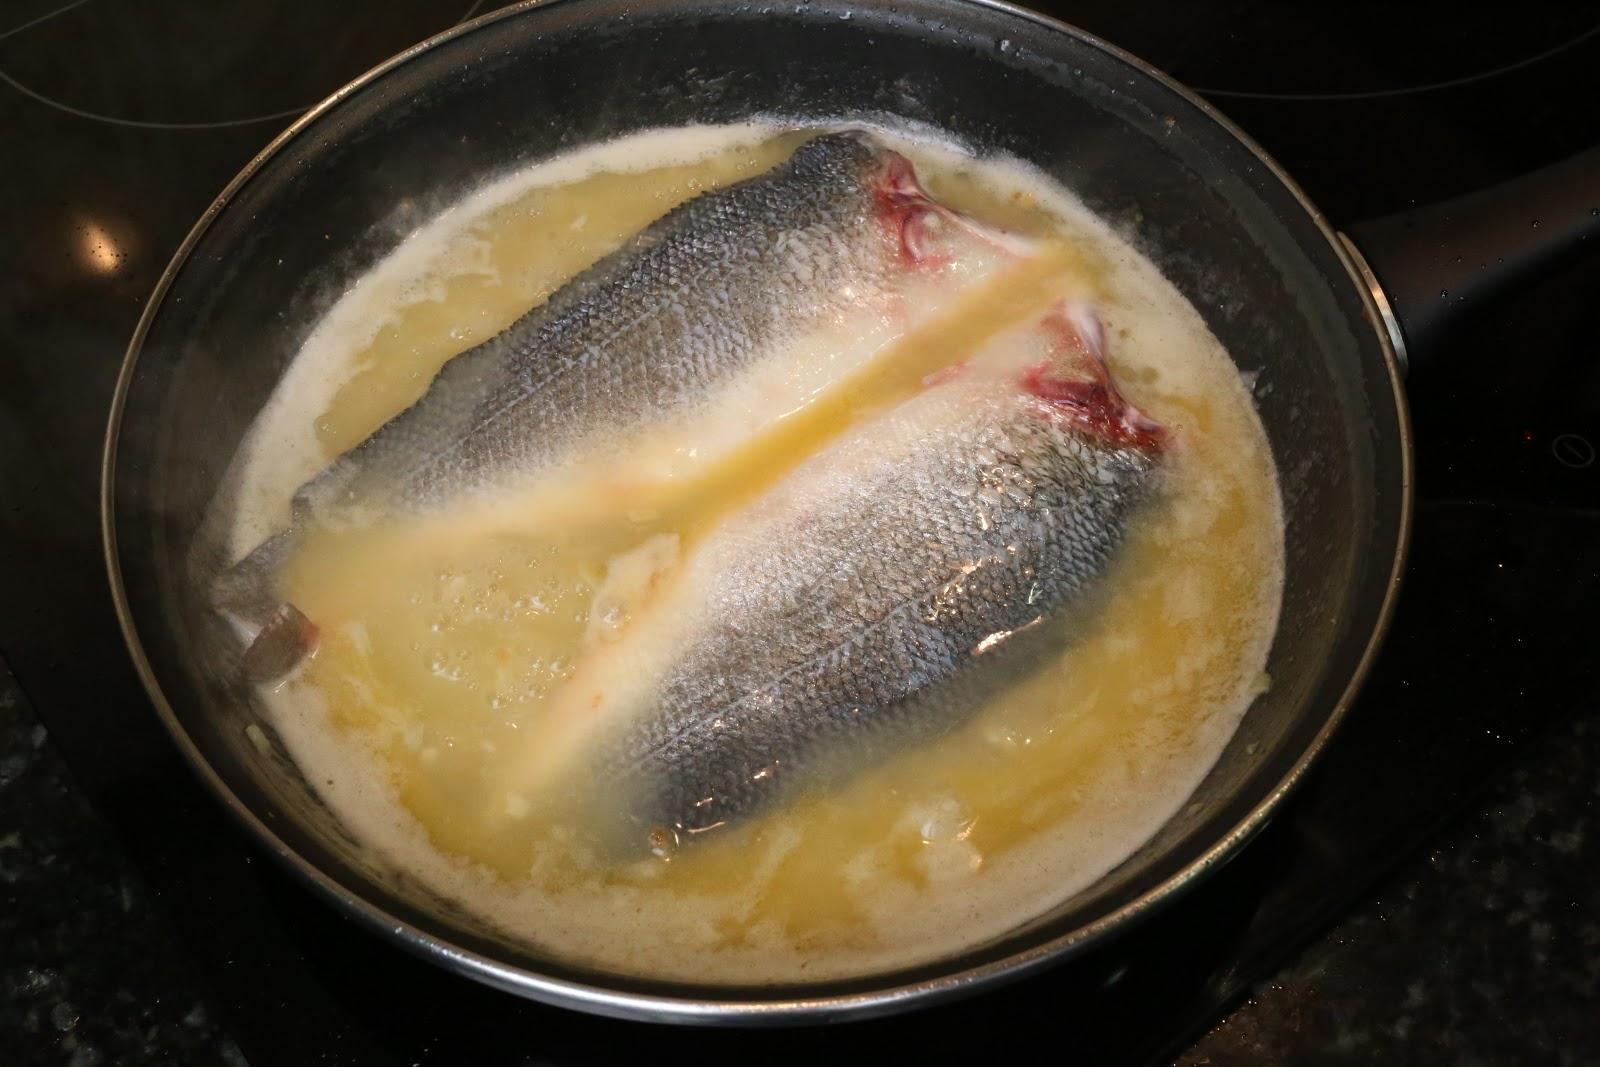 Recetas f ciles de cocina para cocinillas lubina en salsa for Salsa para lubina a la sal